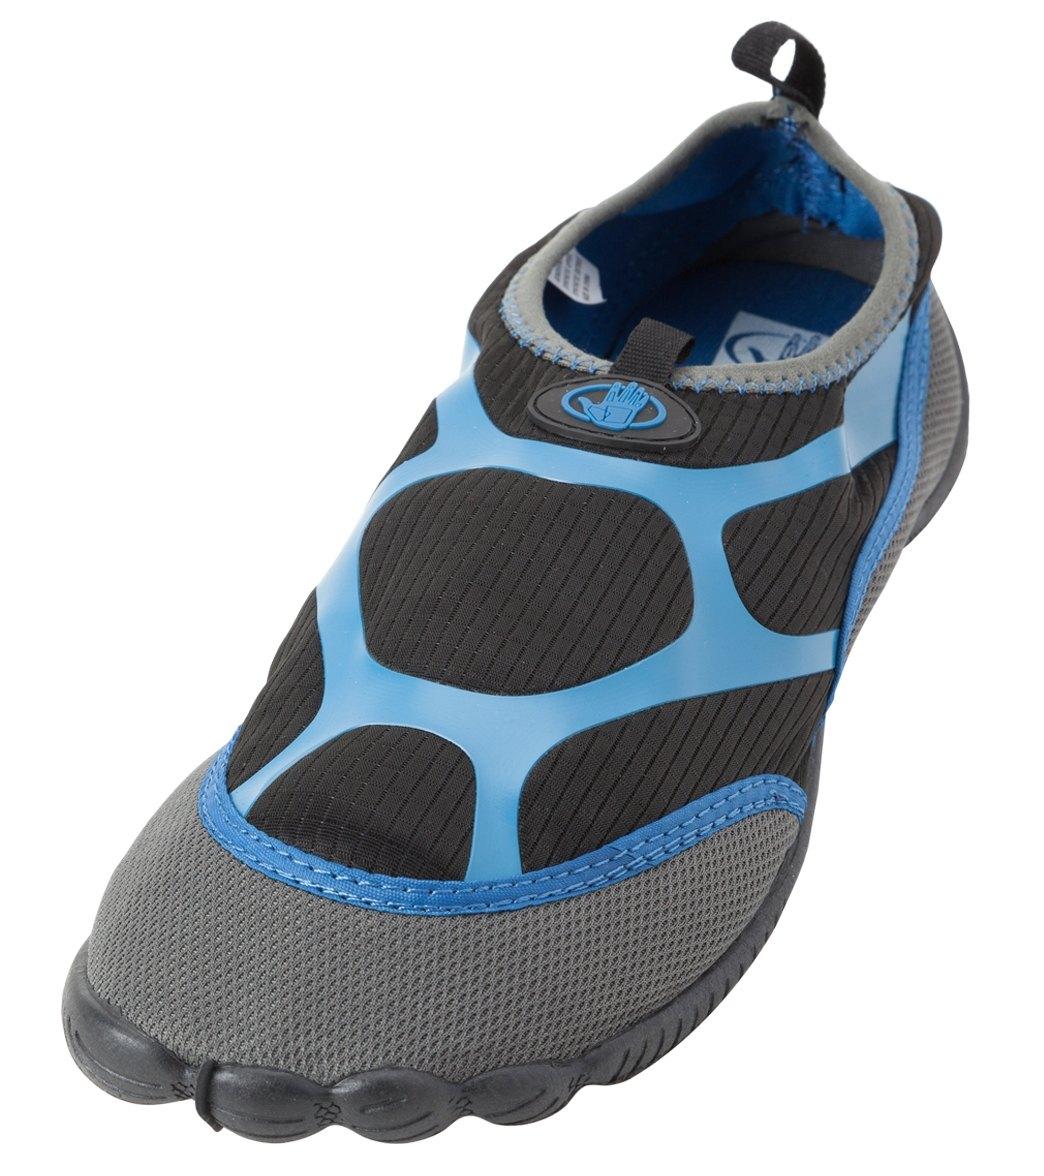 be10e6bb3af9 Body Glove Footwear Men s Delirium Water Shoes at SwimOutlet.com